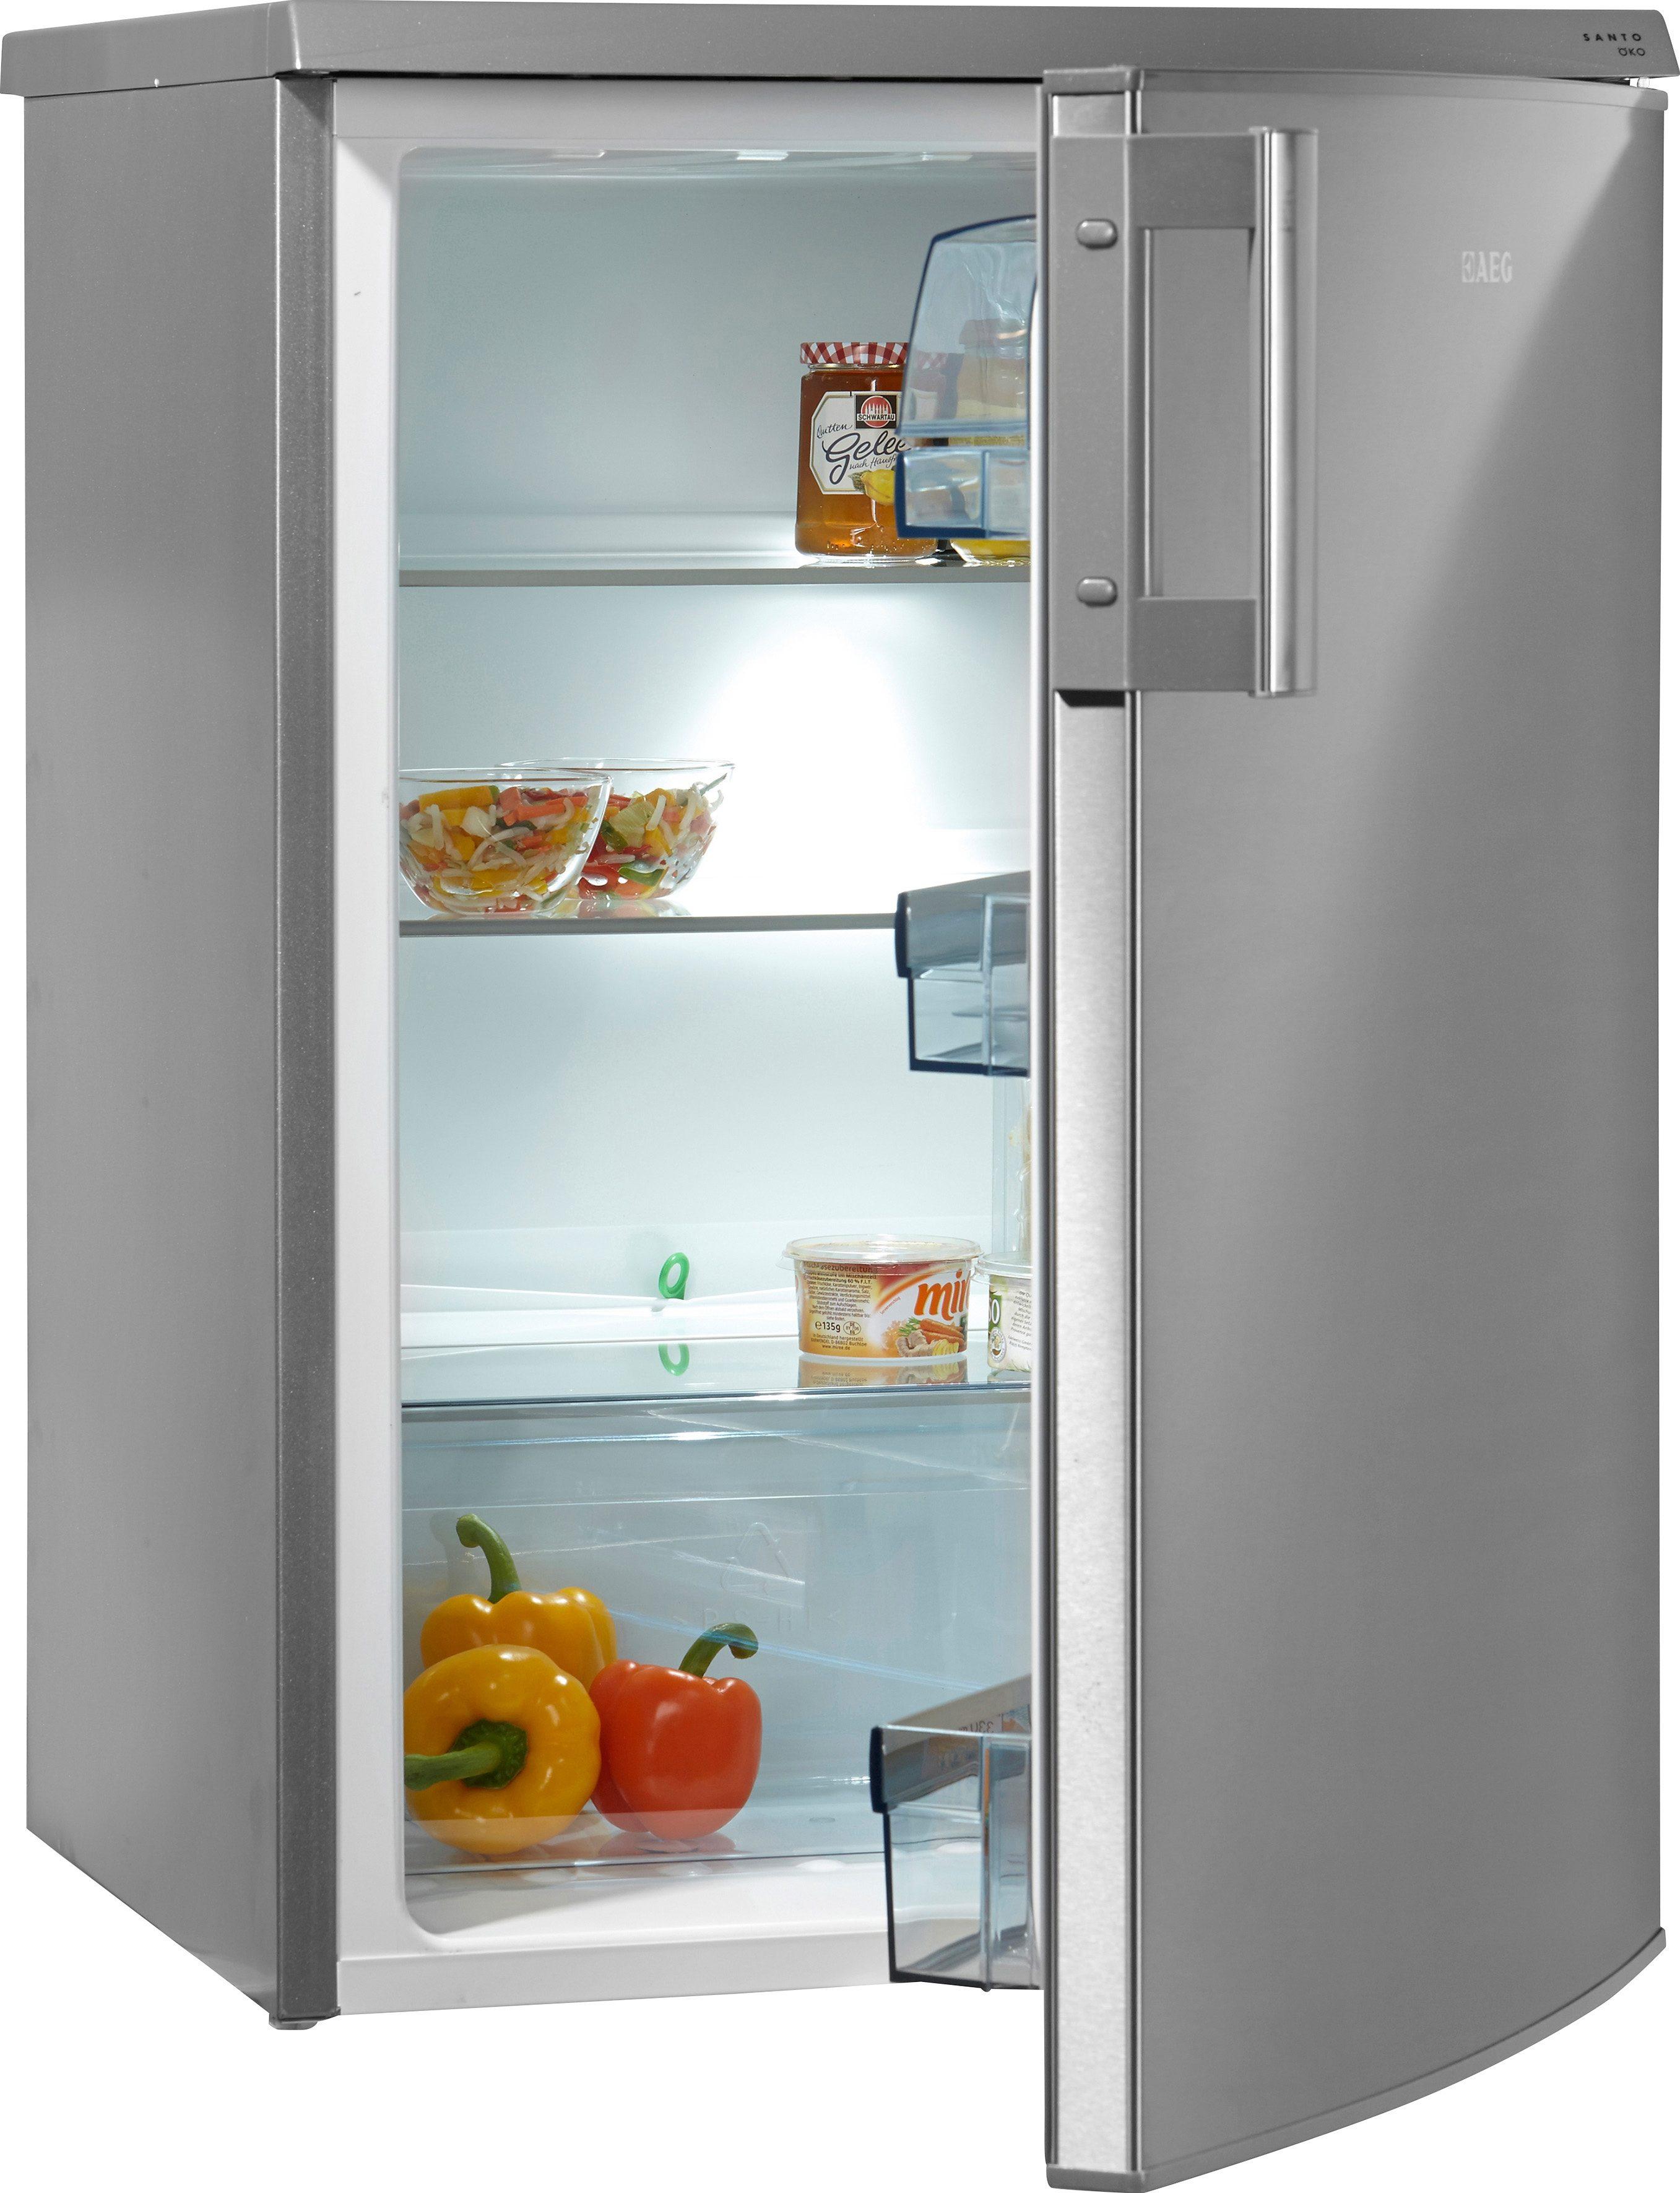 AEG Kühlschrank »SANTO S71700TSX0«, A++, 85 cm hoch